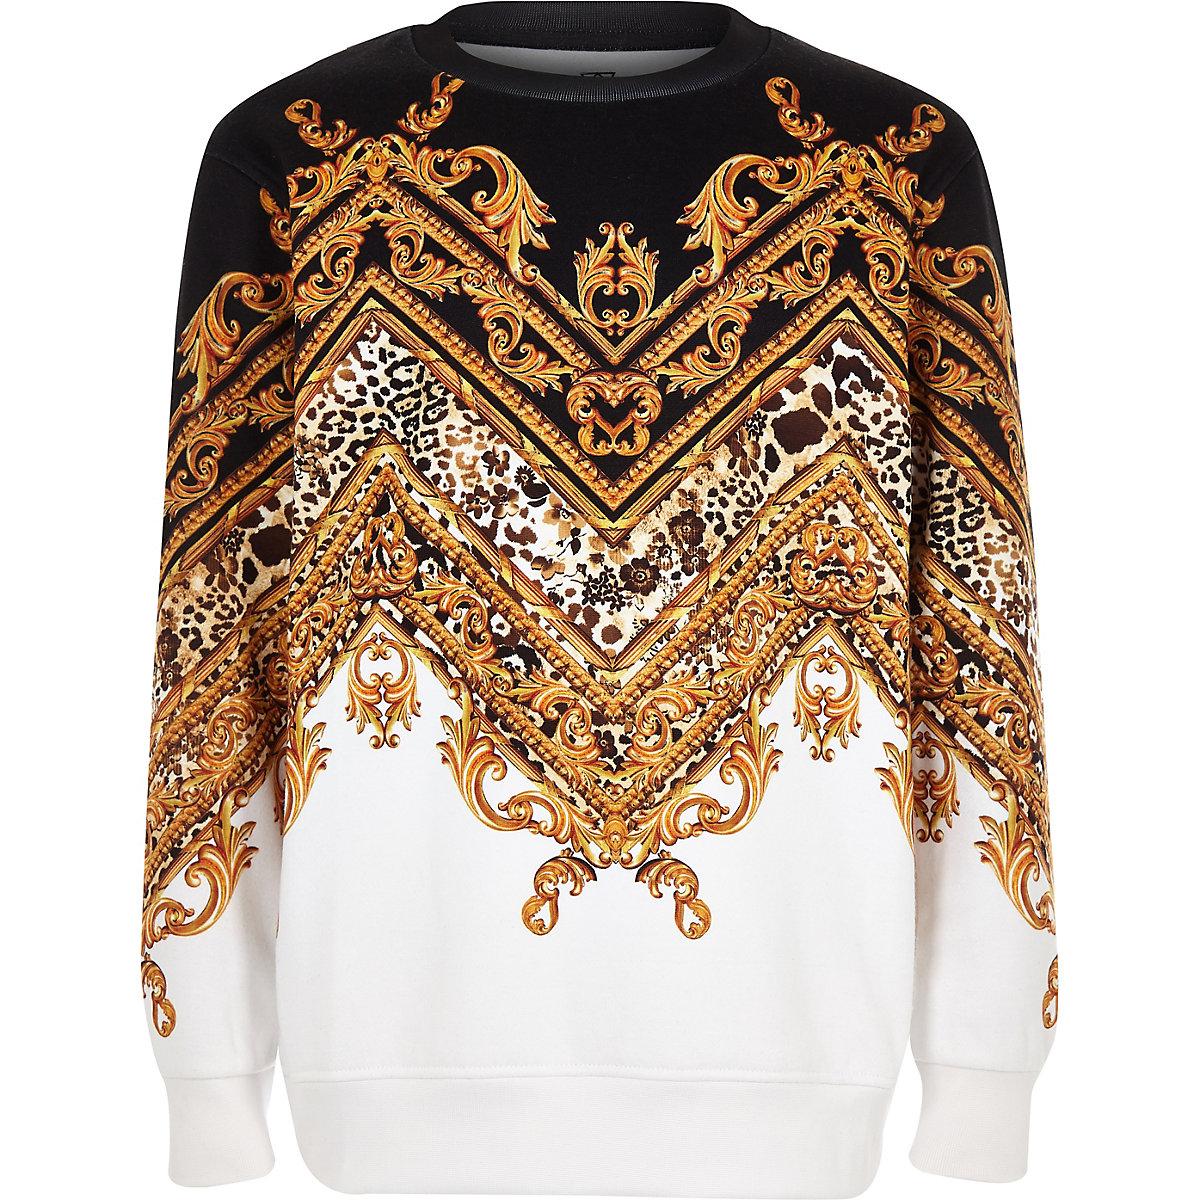 Boys black baroque print chevron sweatshirt